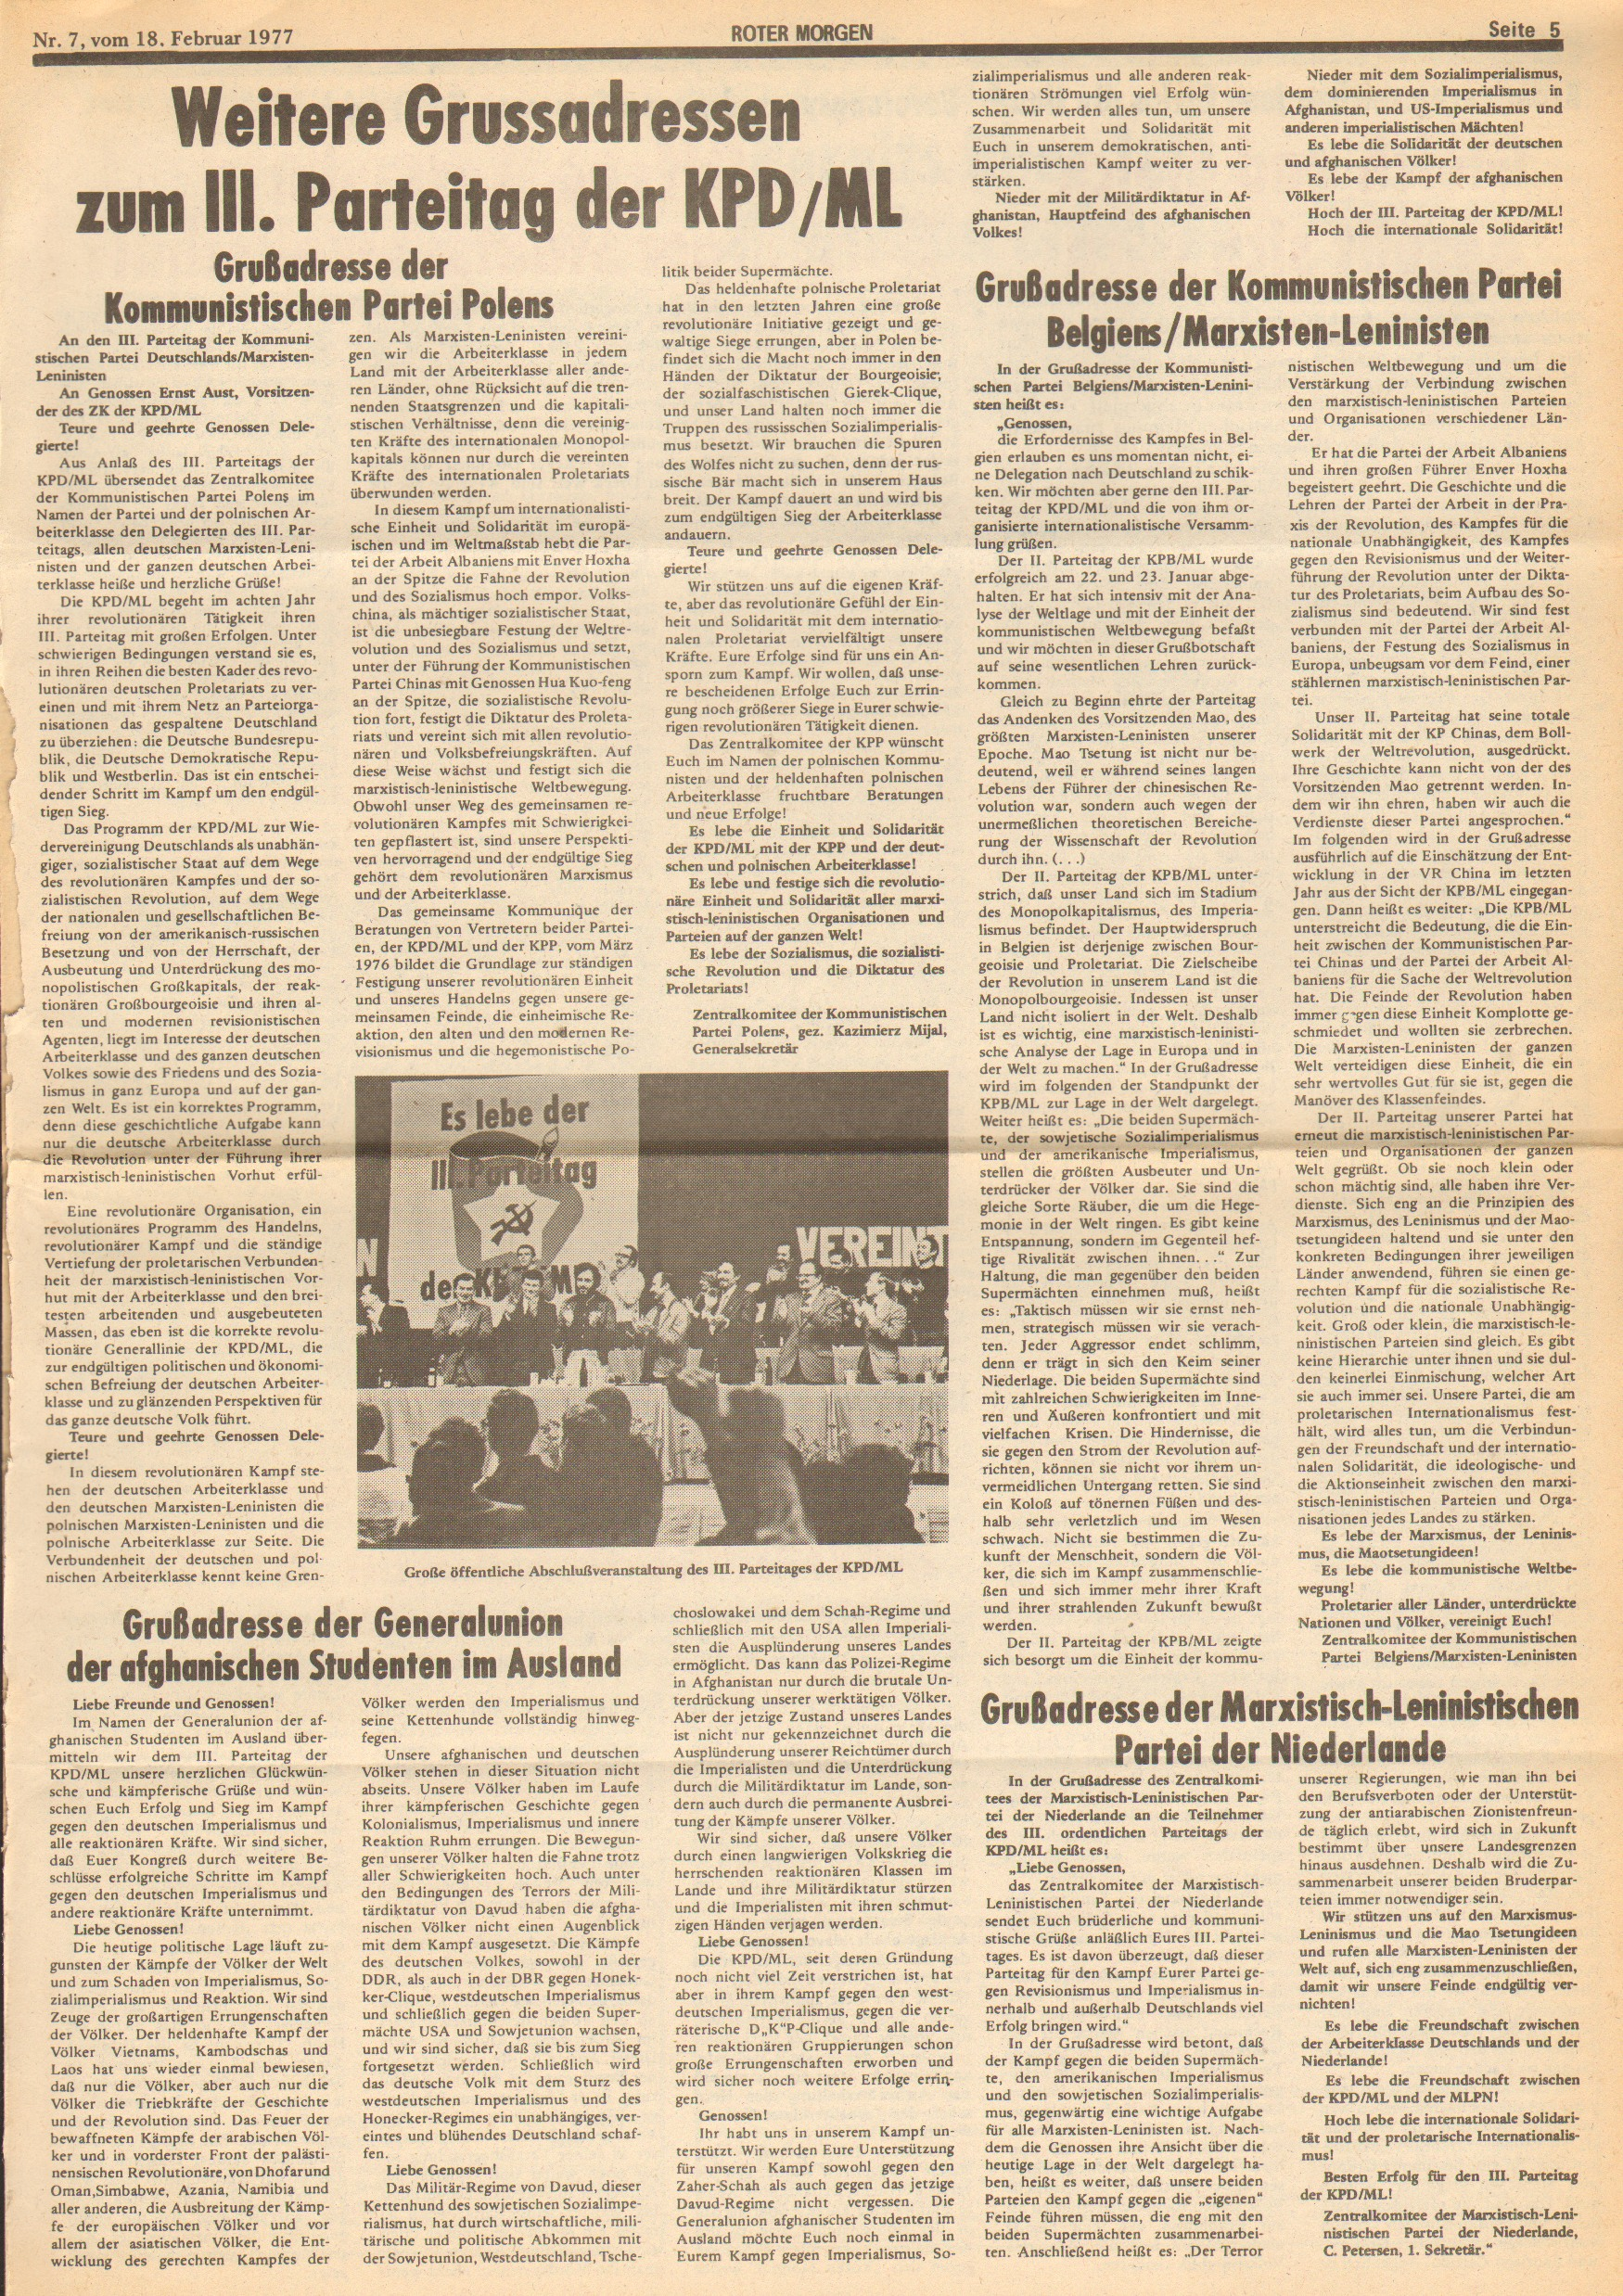 Roter Morgen, 11. Jg., 18. Februar 1977, Nr. 7, Seite 5